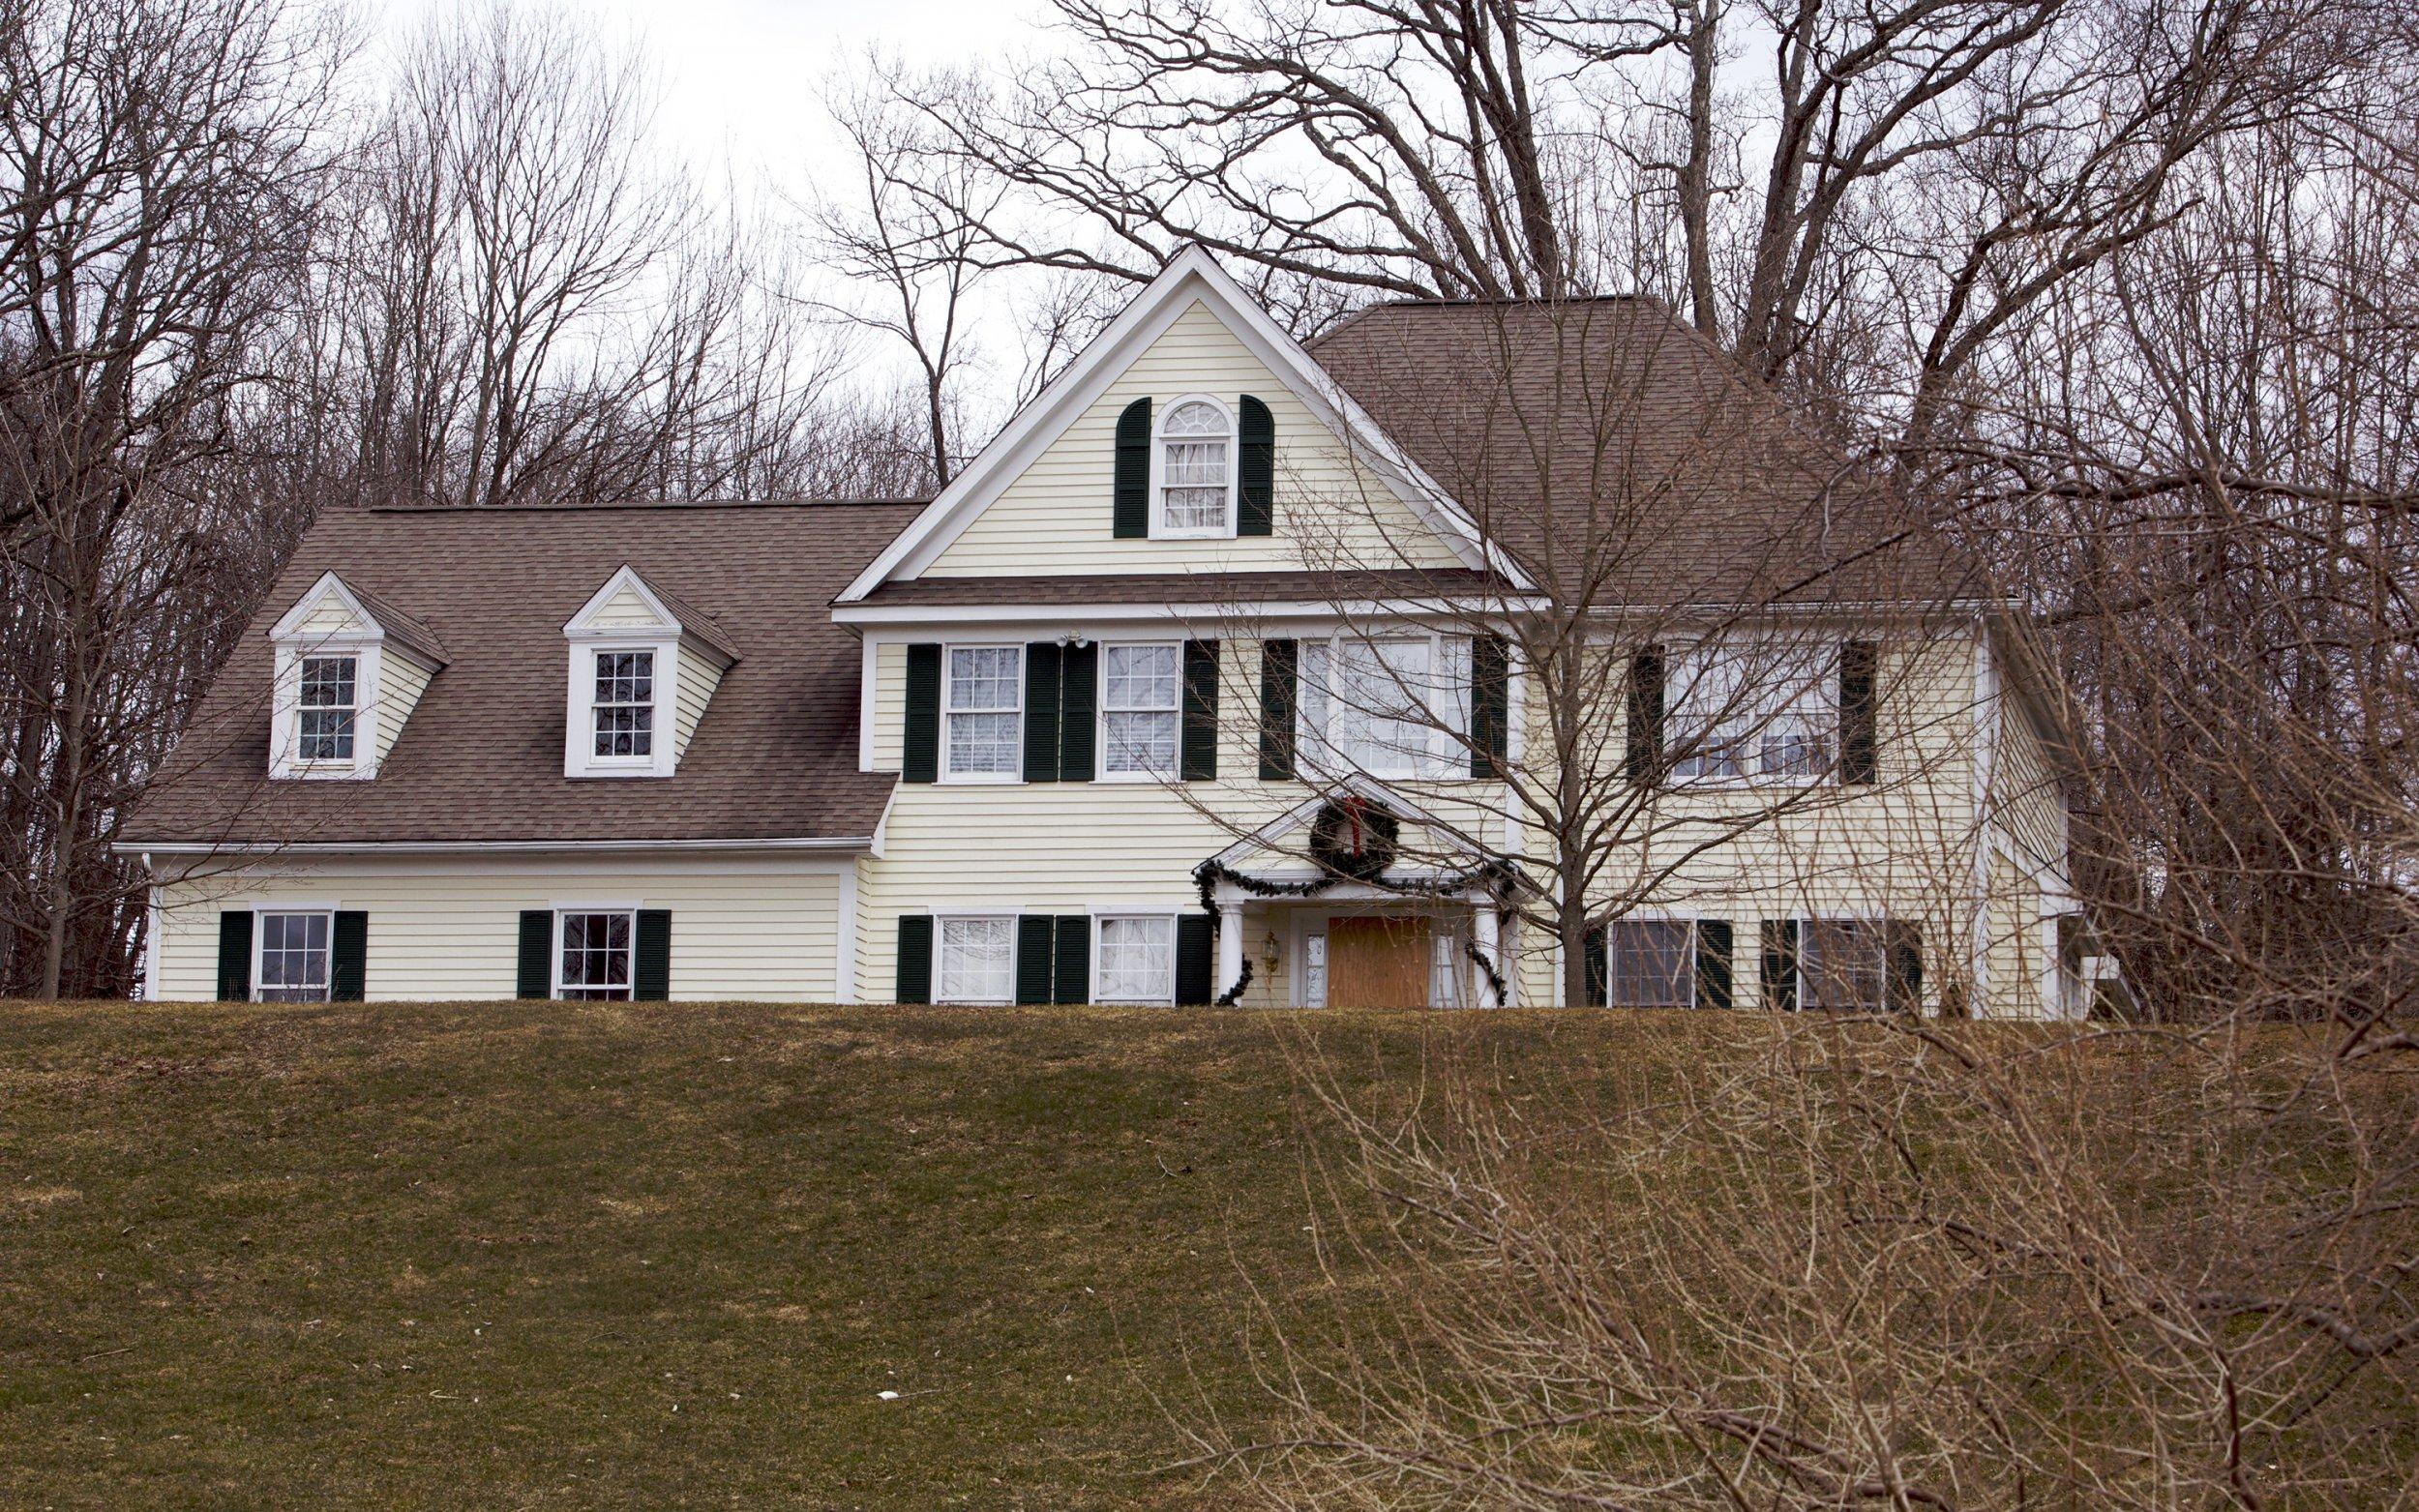 1-22-15 Lanza house